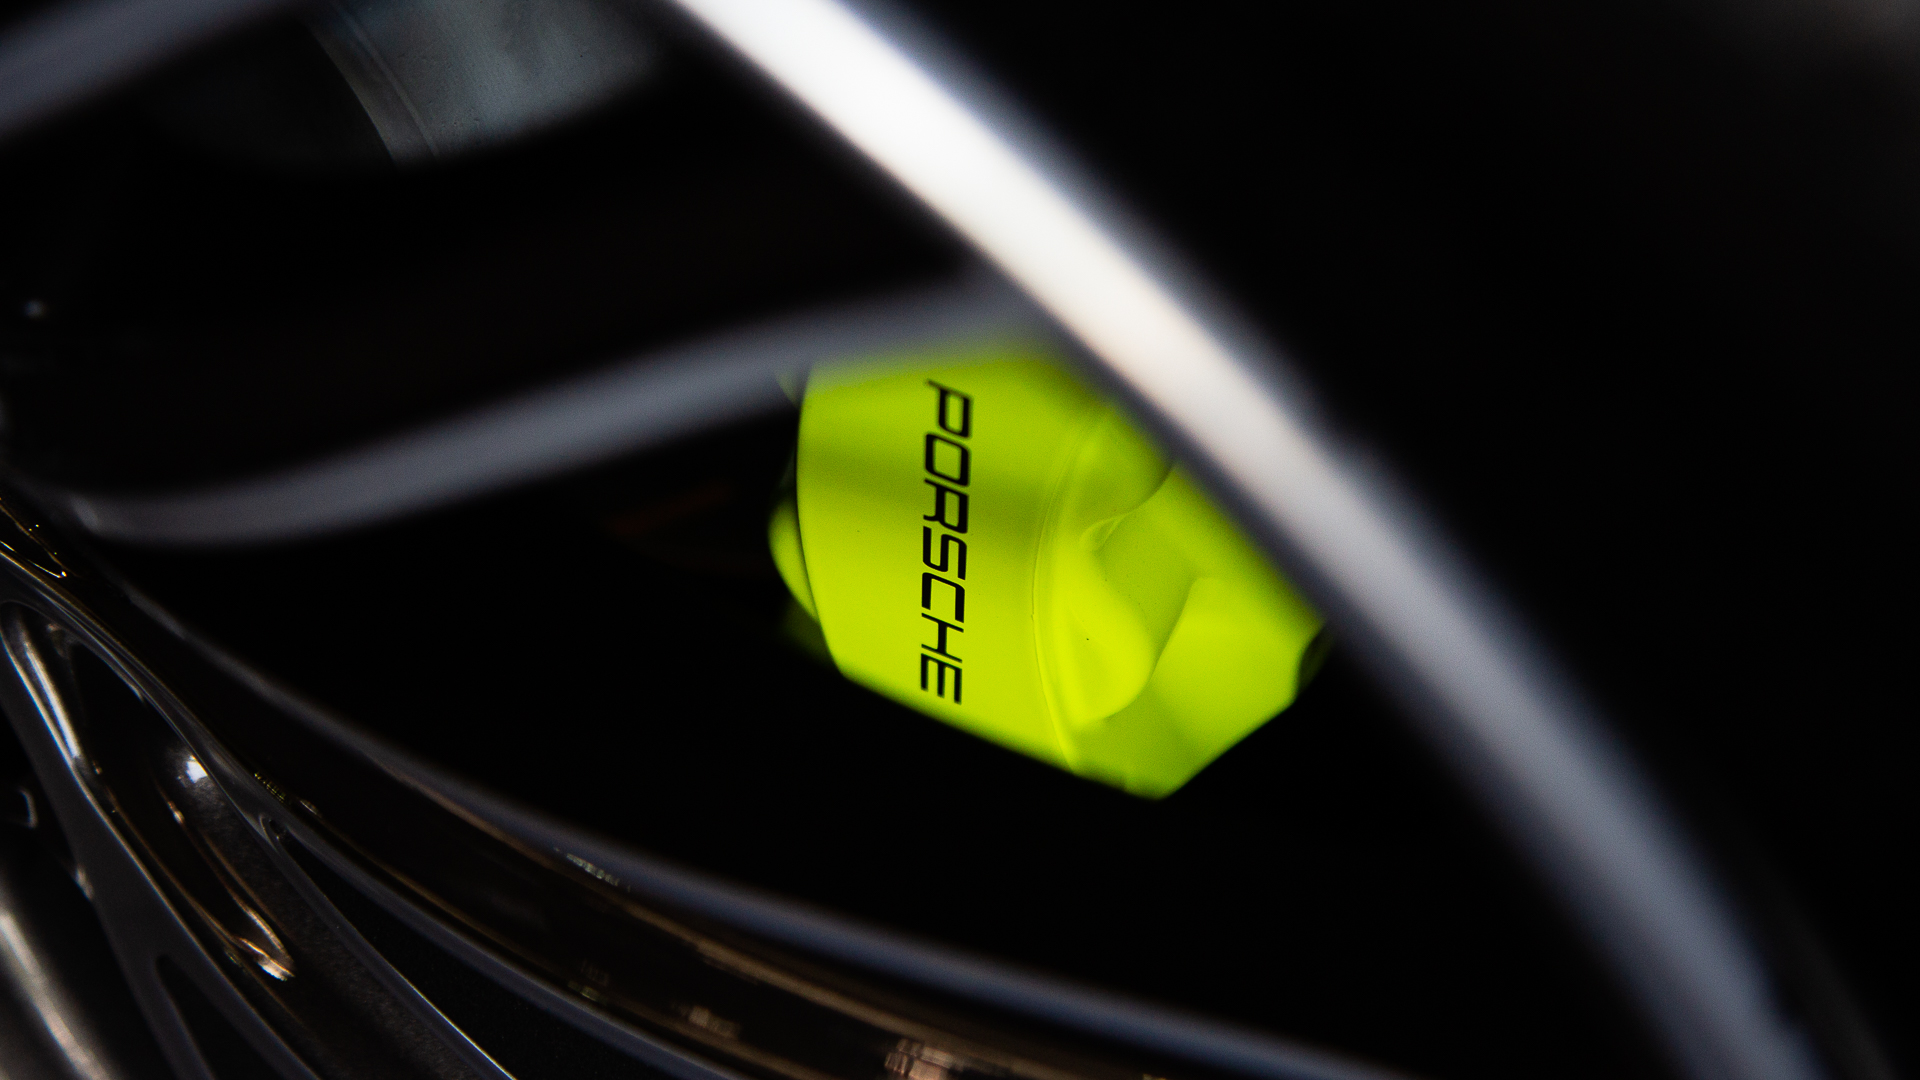 Porsche-Austin-2018-Panamera-11.jpg